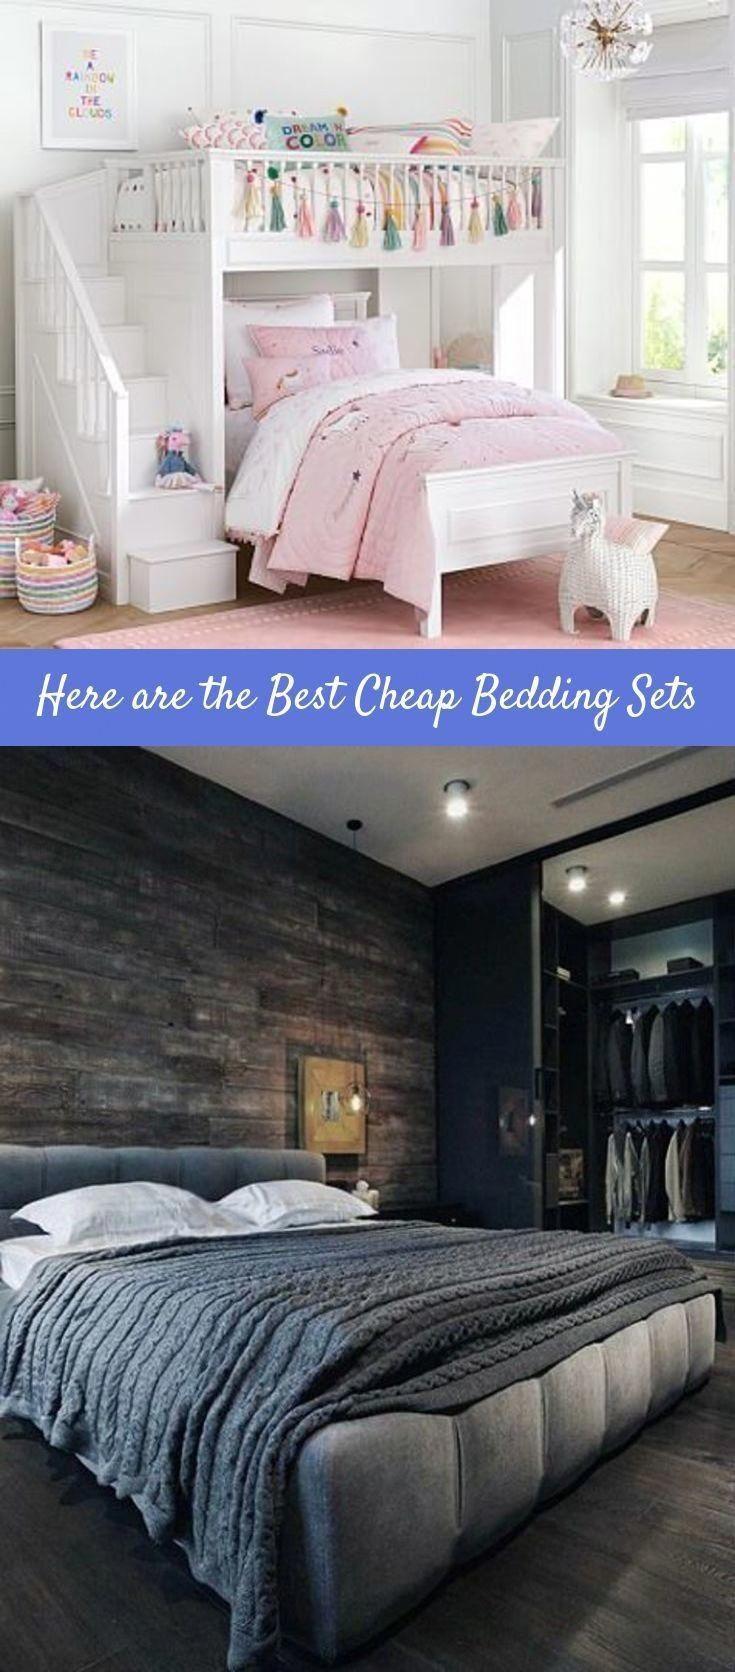 7 Best Bed Linen Set Decors Onsalebedsheets On Sale Bed Sheets